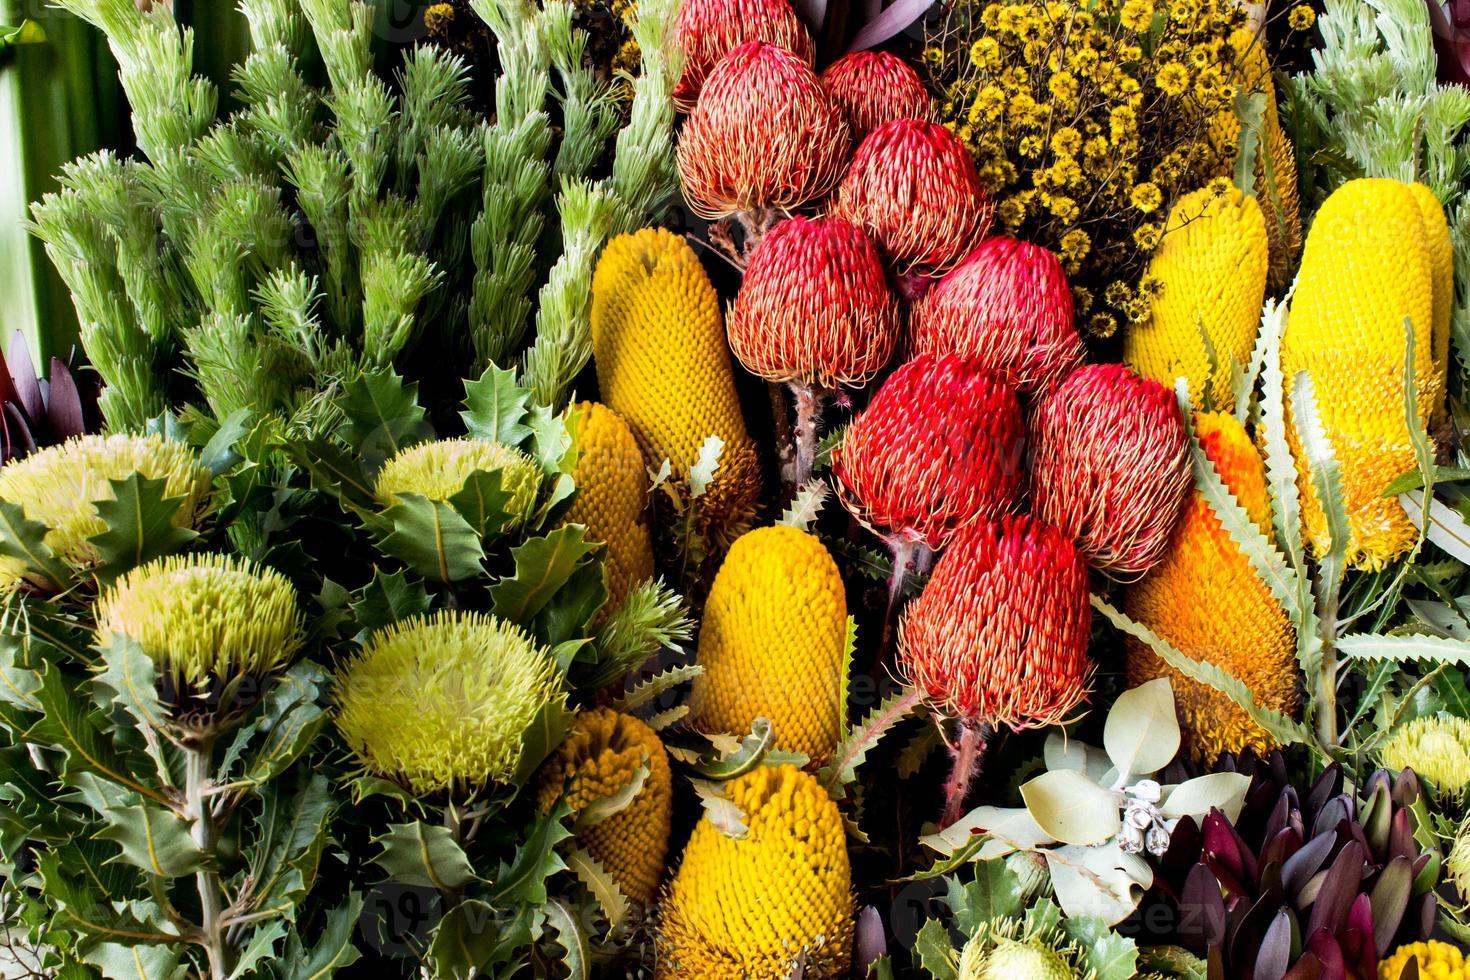 wildflowers australianos de banksia e waratah foto